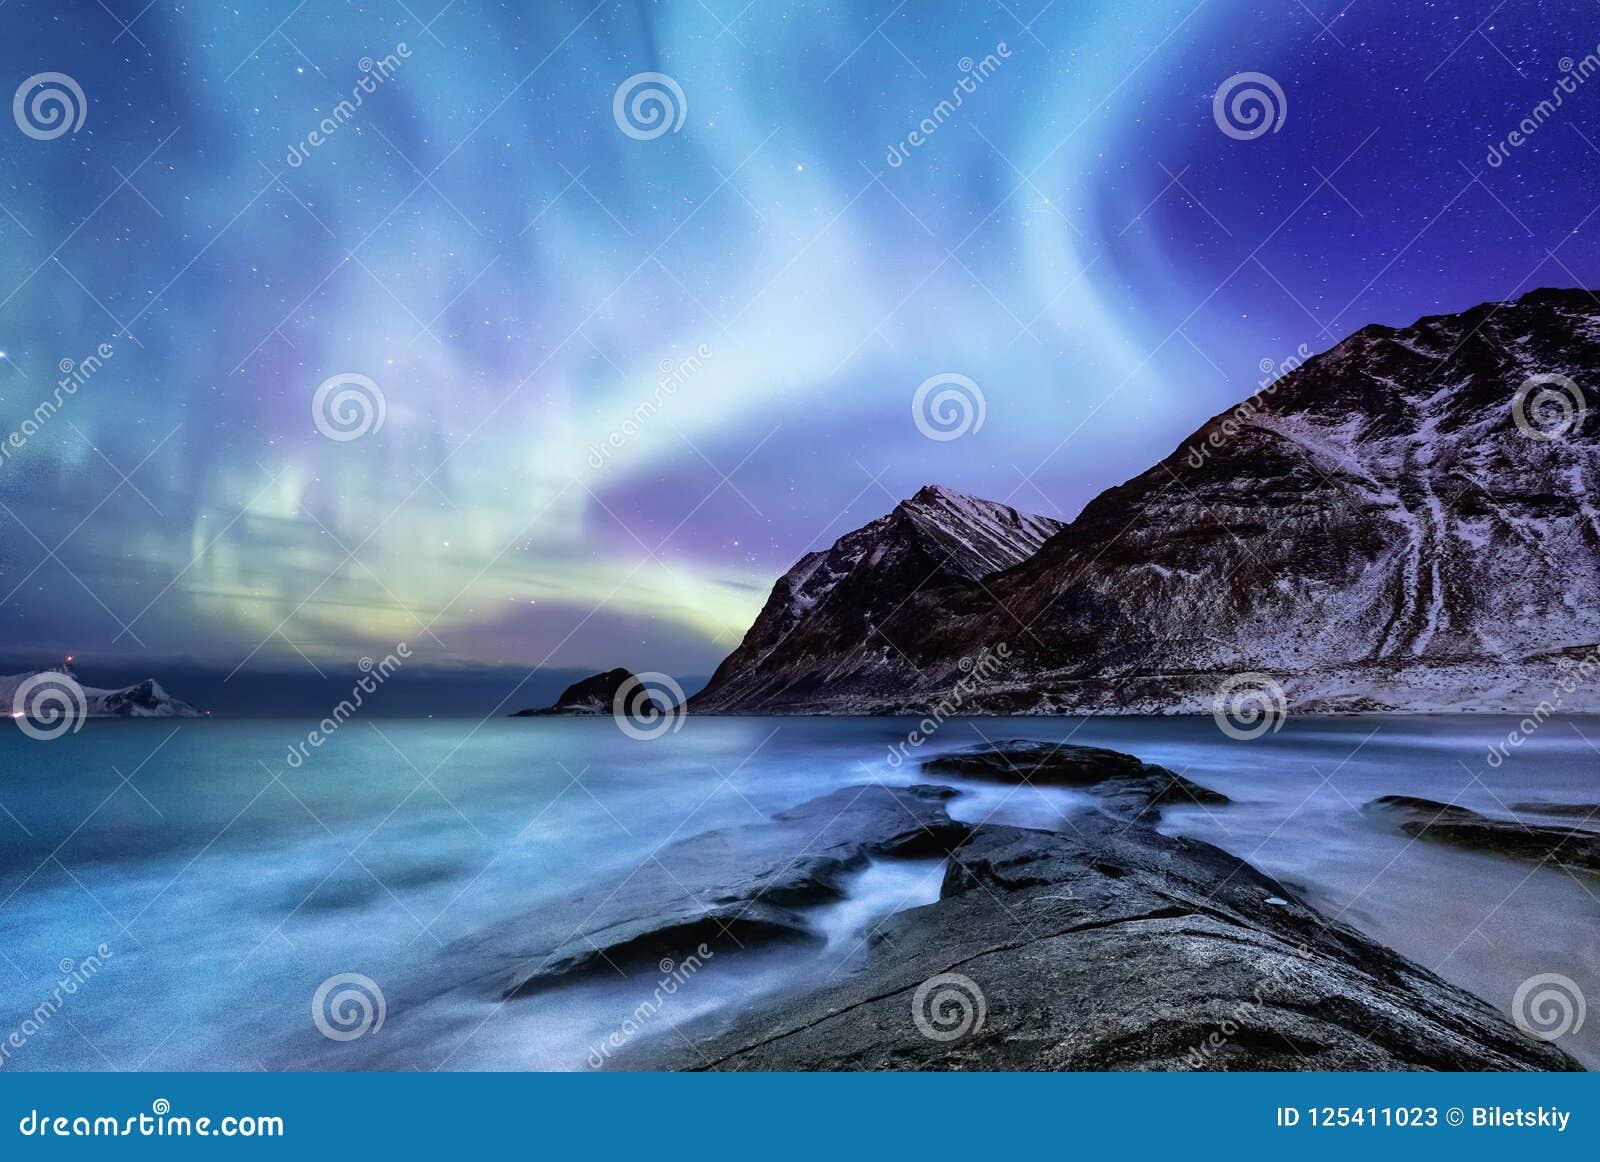 Aurora borealis on the Lofoten islands, Norway. Green northern lights above mountains. Night sky with polar lights.